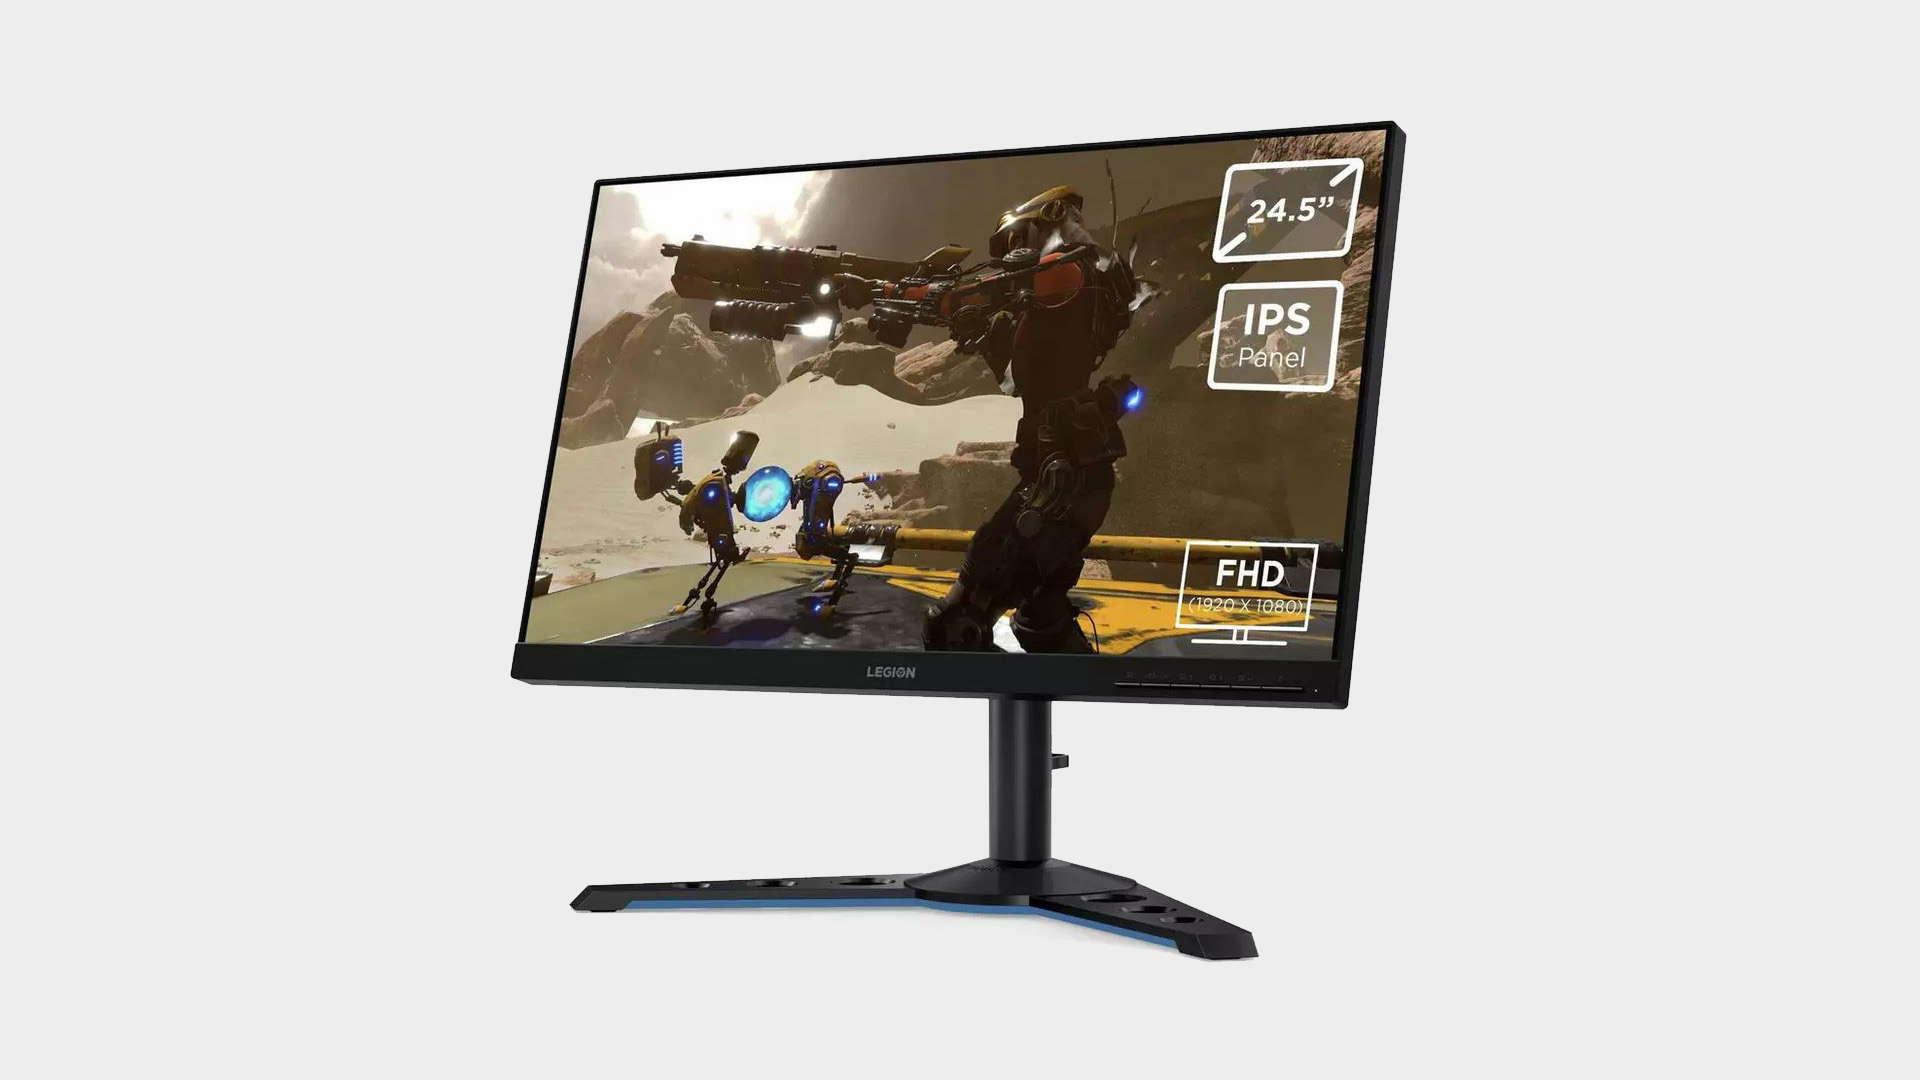 Lenovo Legion Y25-25 high refresh rate gaming monitor